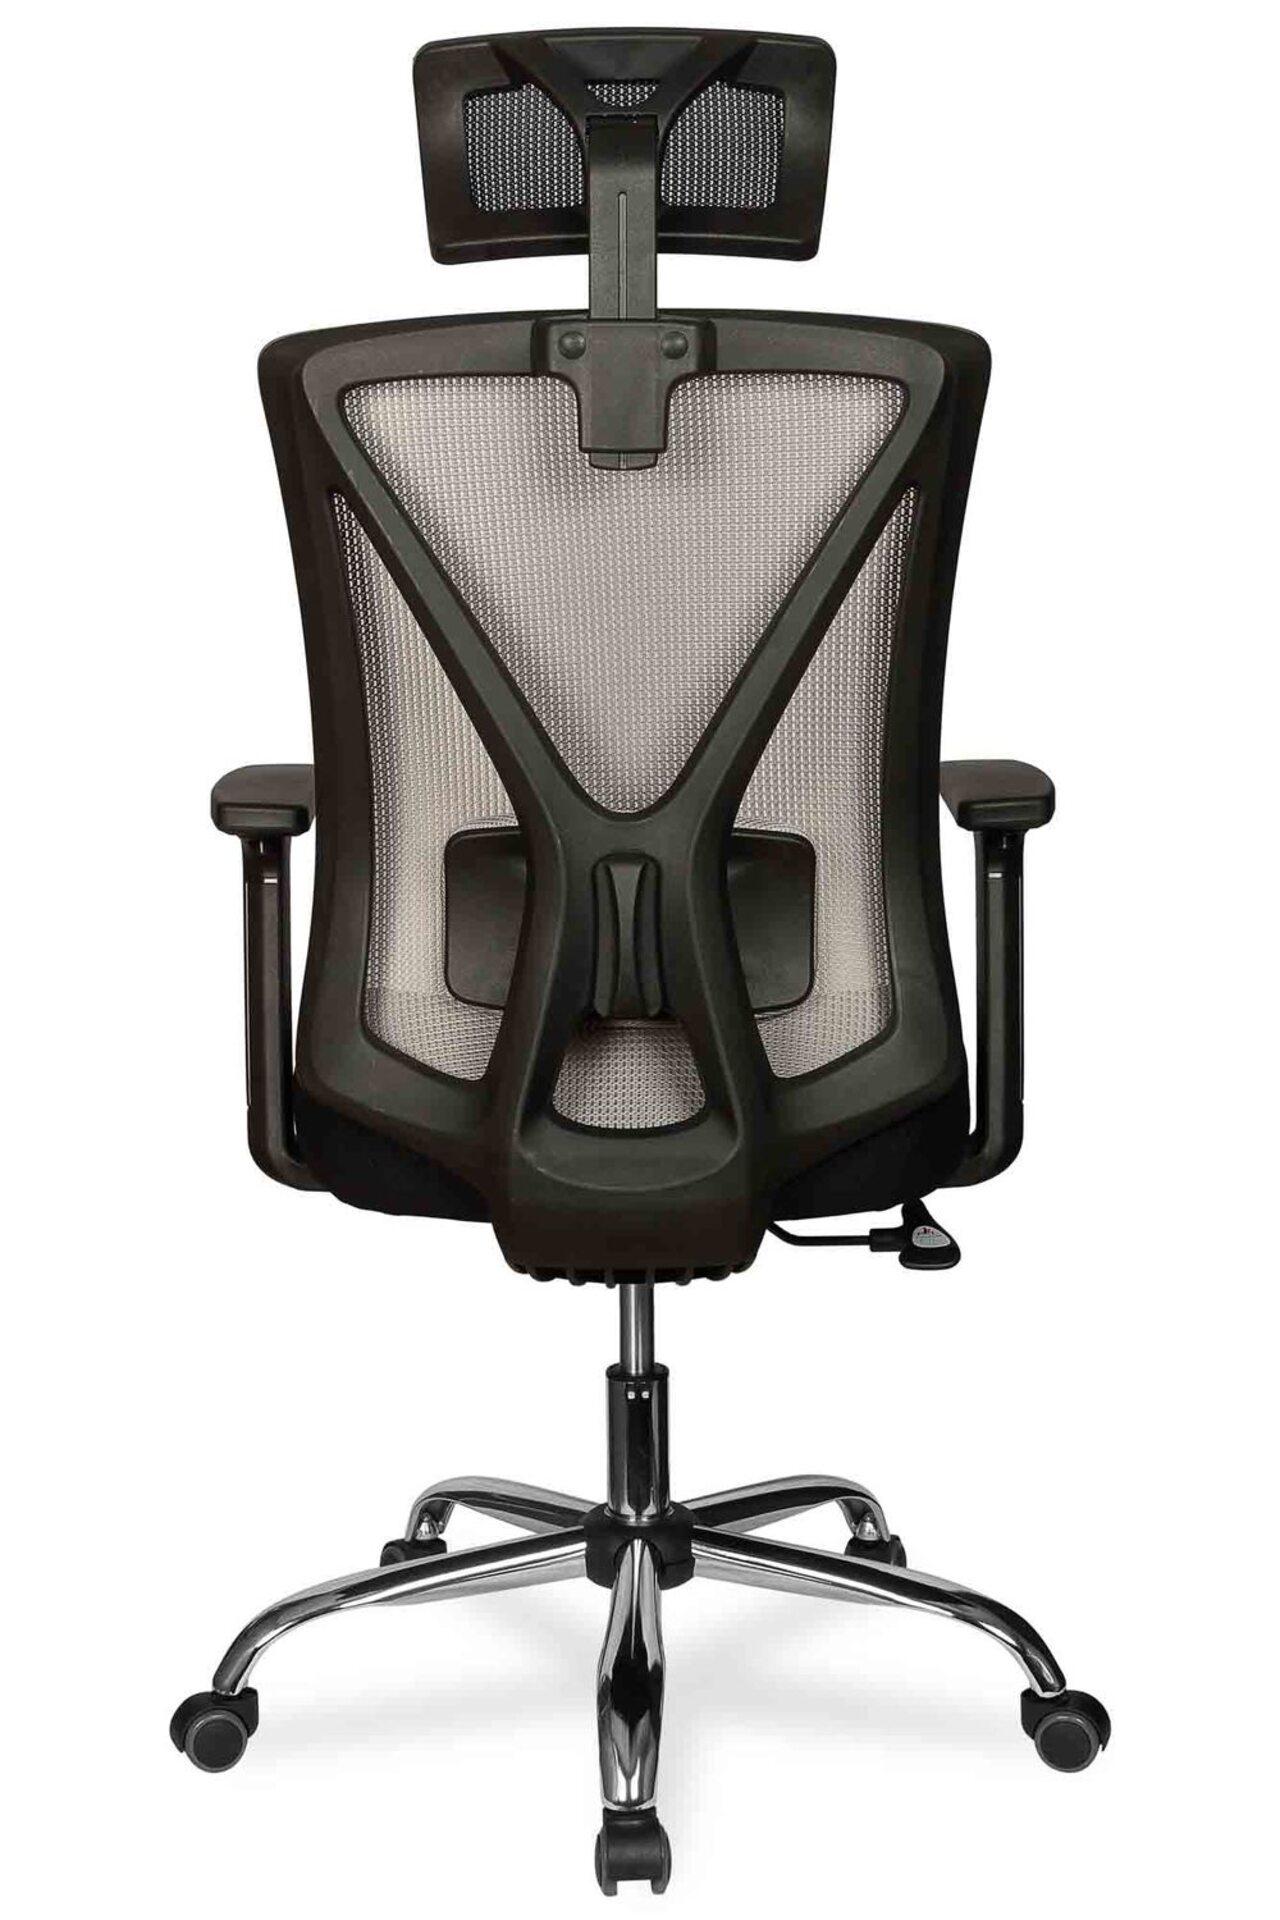 Кресло руководителя College CLG-424 MXH-A - фото 4